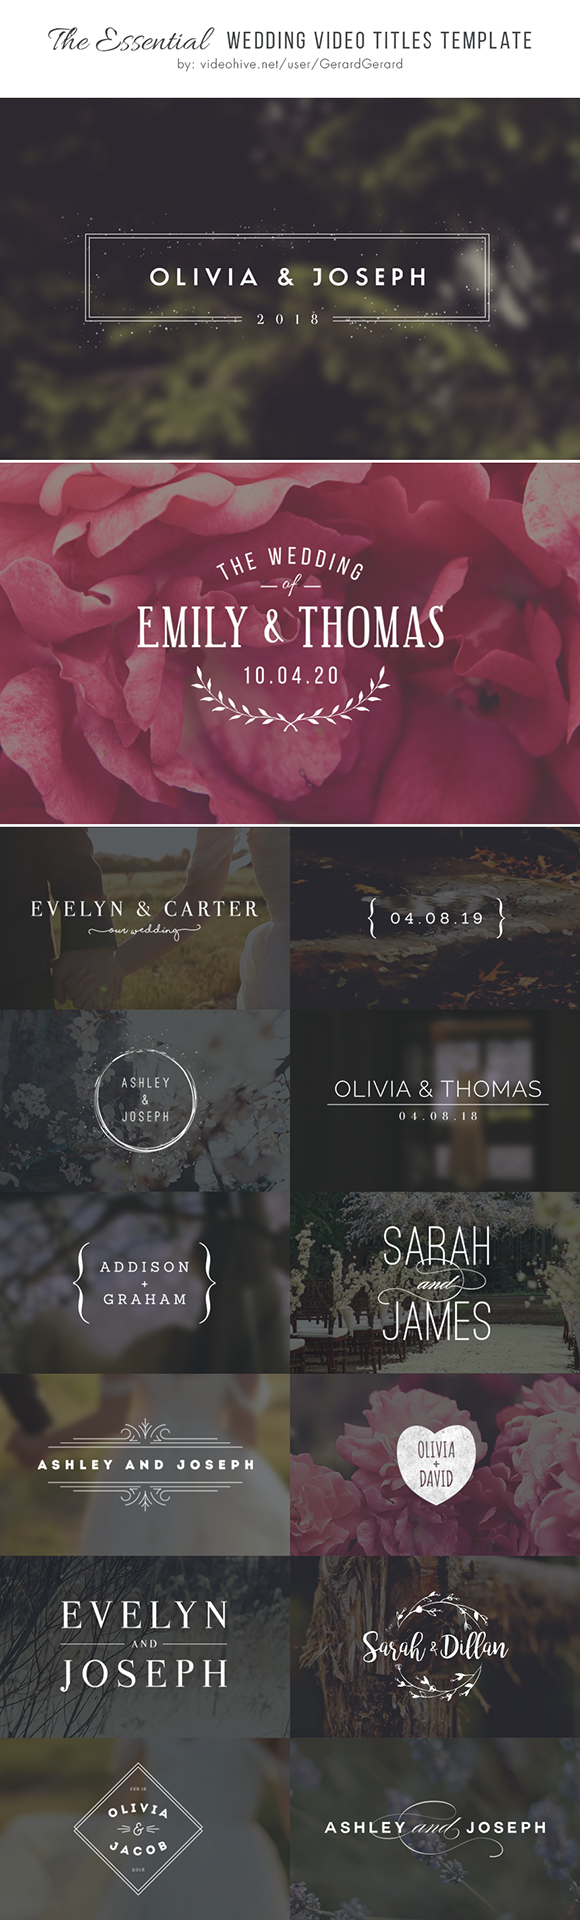 online editable wedding invitation templates%0A Wedding Titles